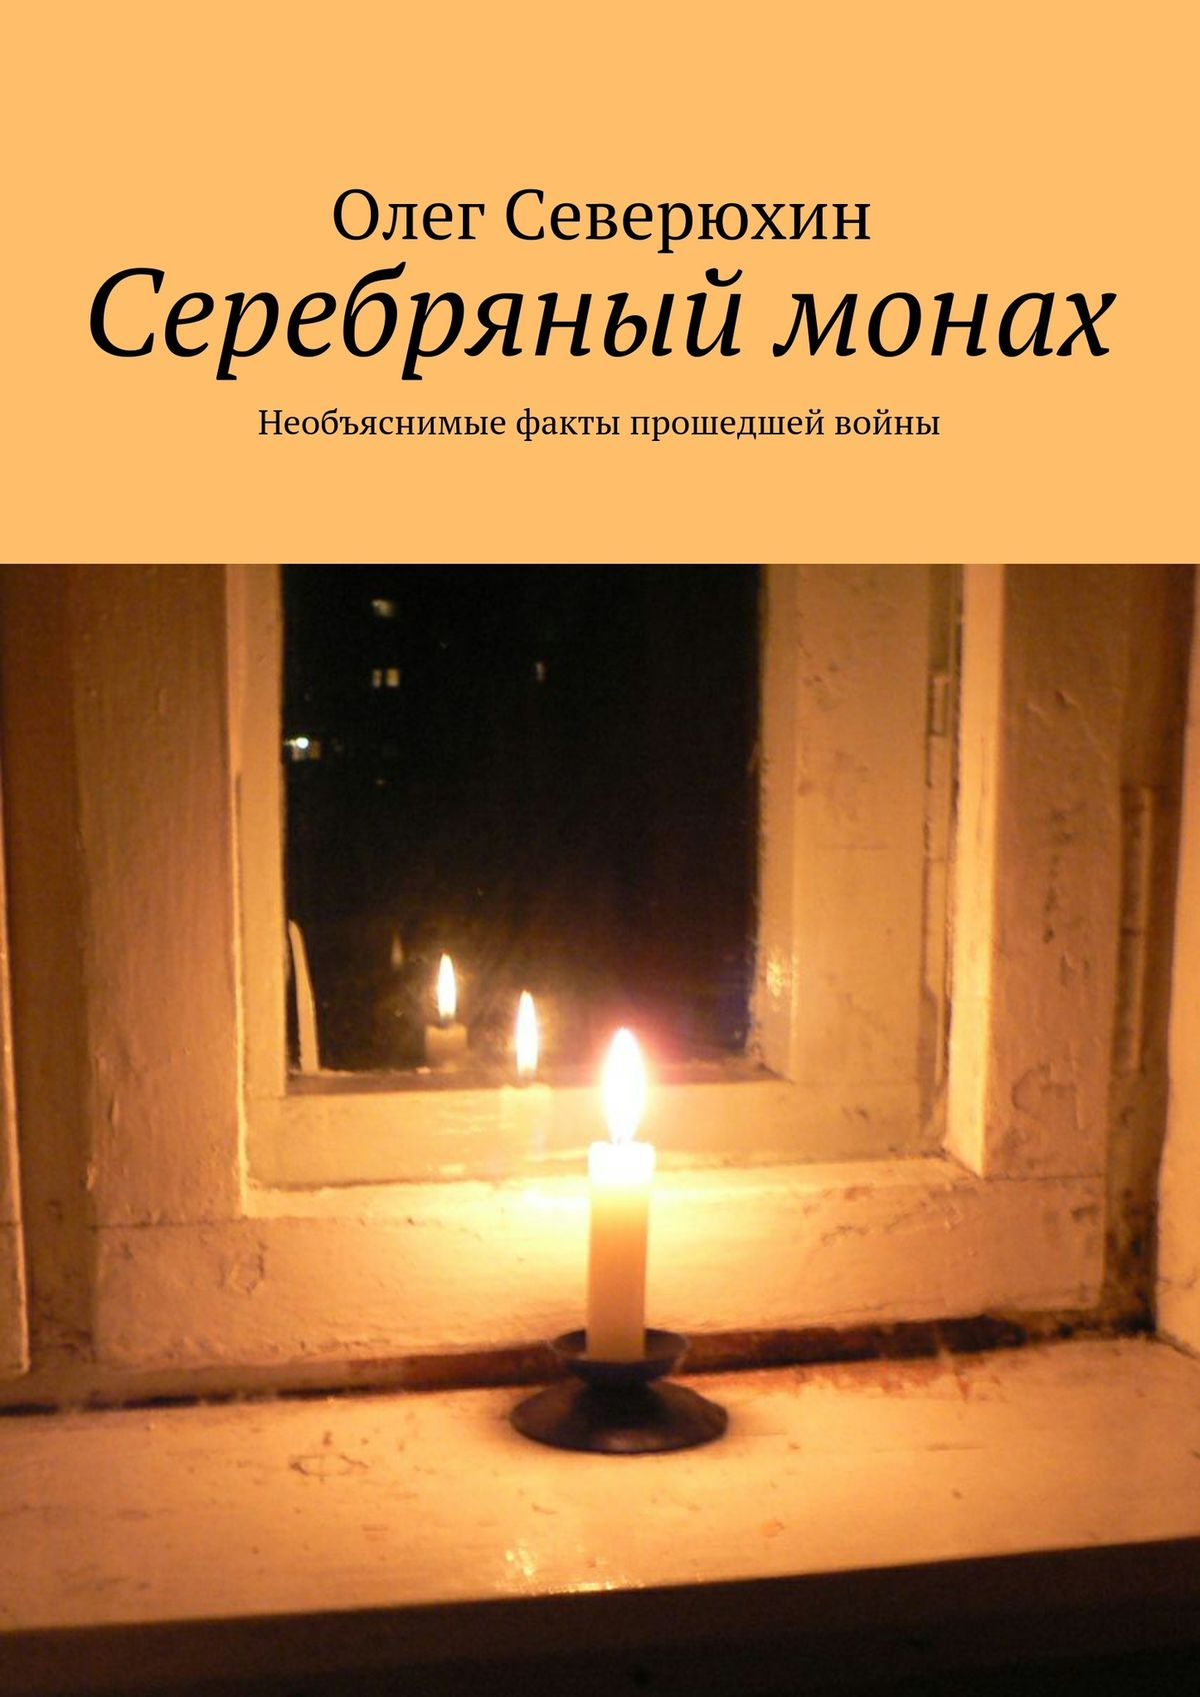 Олег Васильевич Северюхин Серебряный монах вибромассажер posh teaser 1 розовый